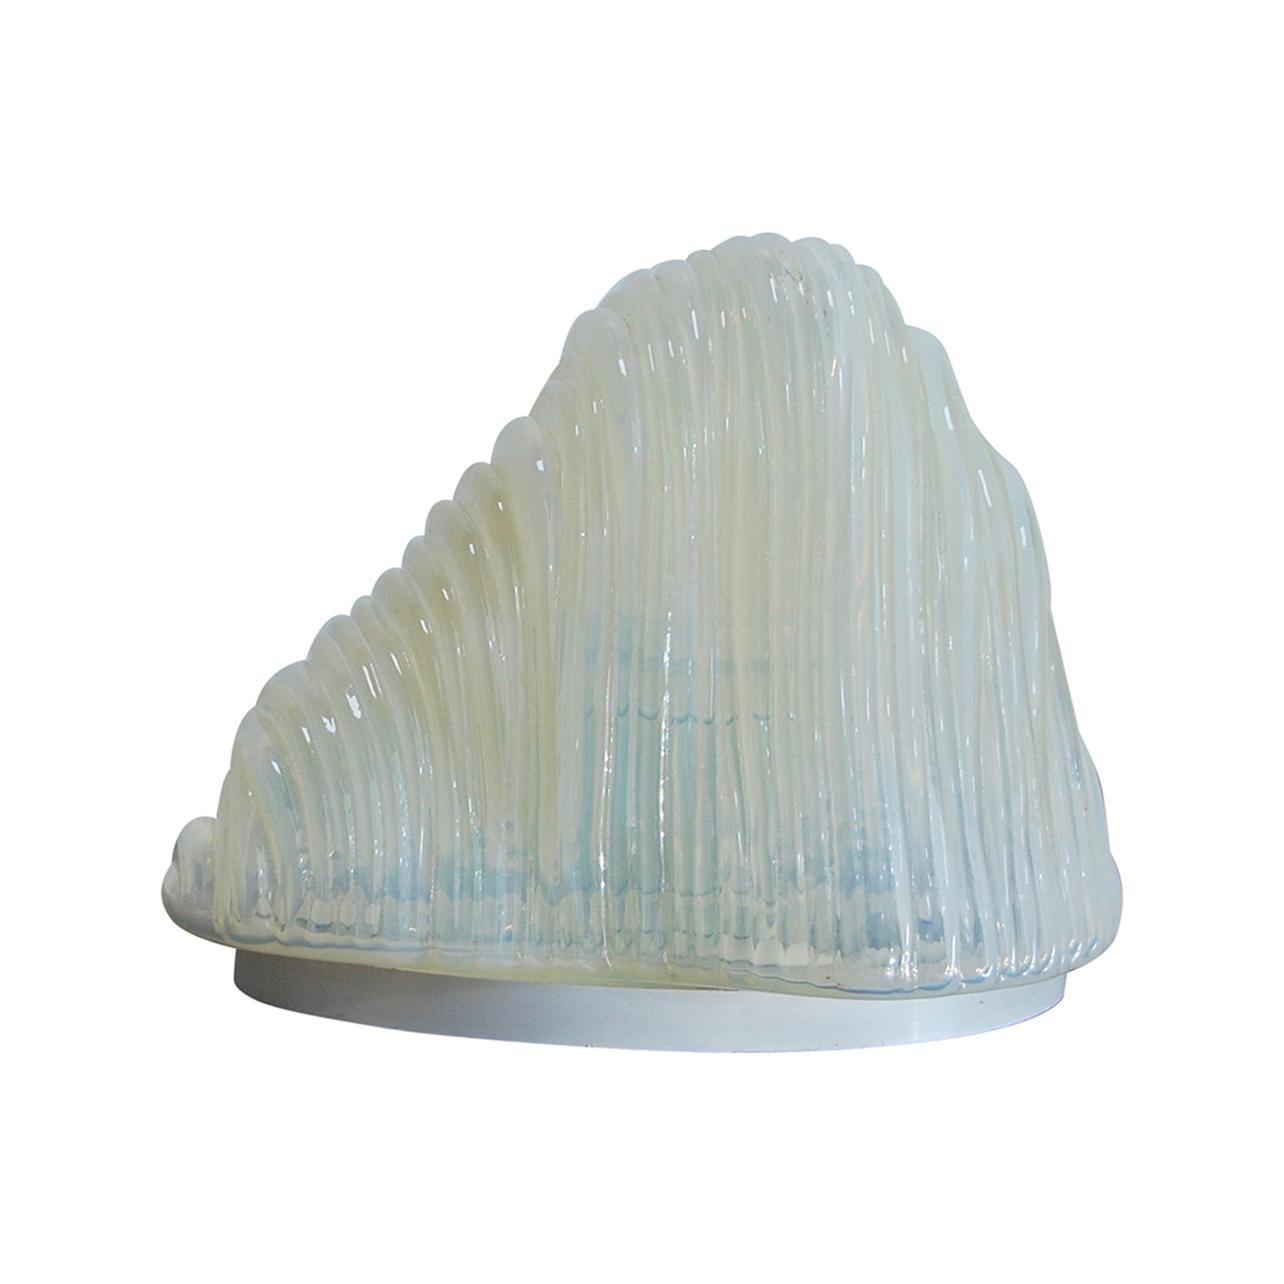 1960s Iceberg Table Lamp by Carlo Nason for Mazzega